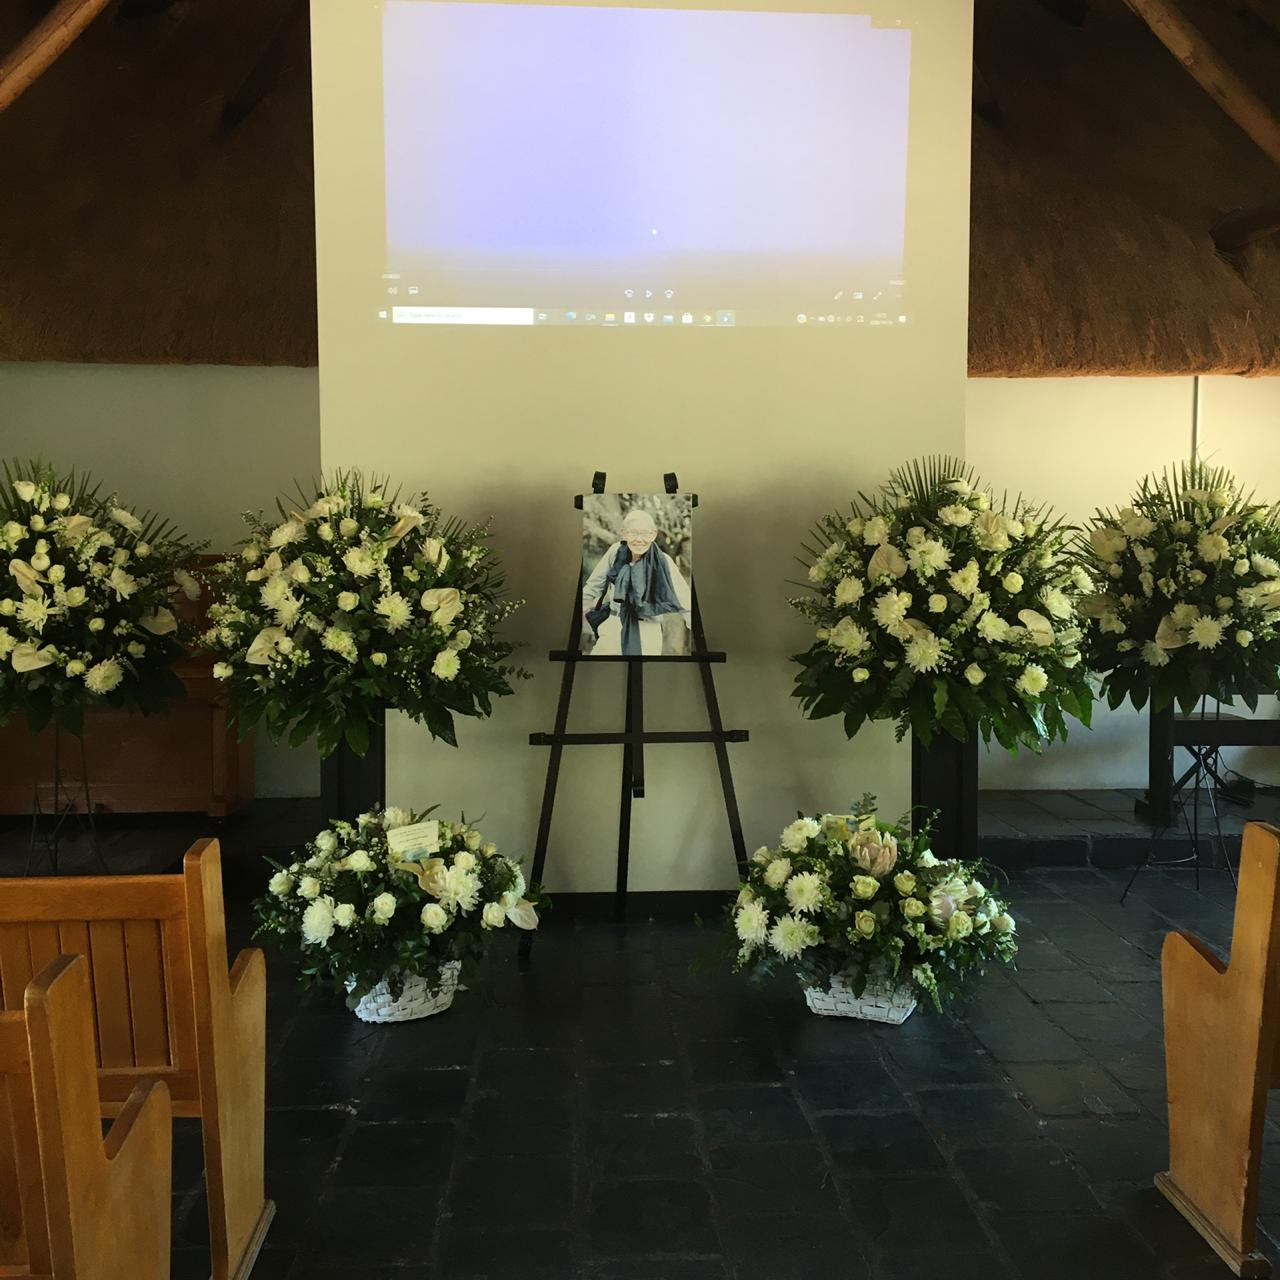 Chapel Setup including 2 baskets and 4 white flower arrangements